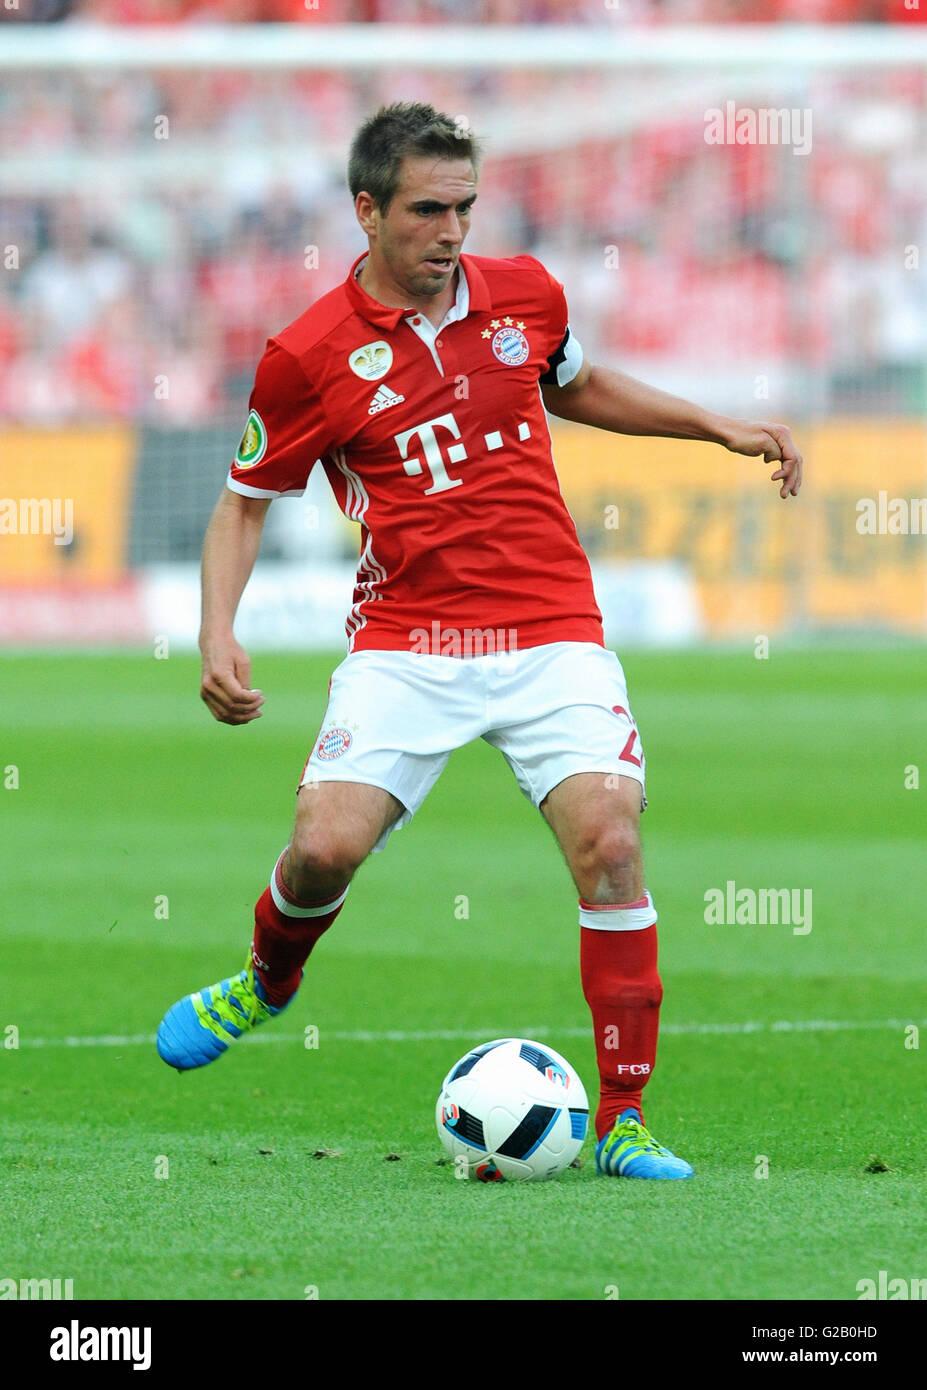 German Cup Final at Olympic Stadium Berlin, FC Bayern Munich vs Borussia Dortmund: Philipp Lahm of Munich. - Stock Image